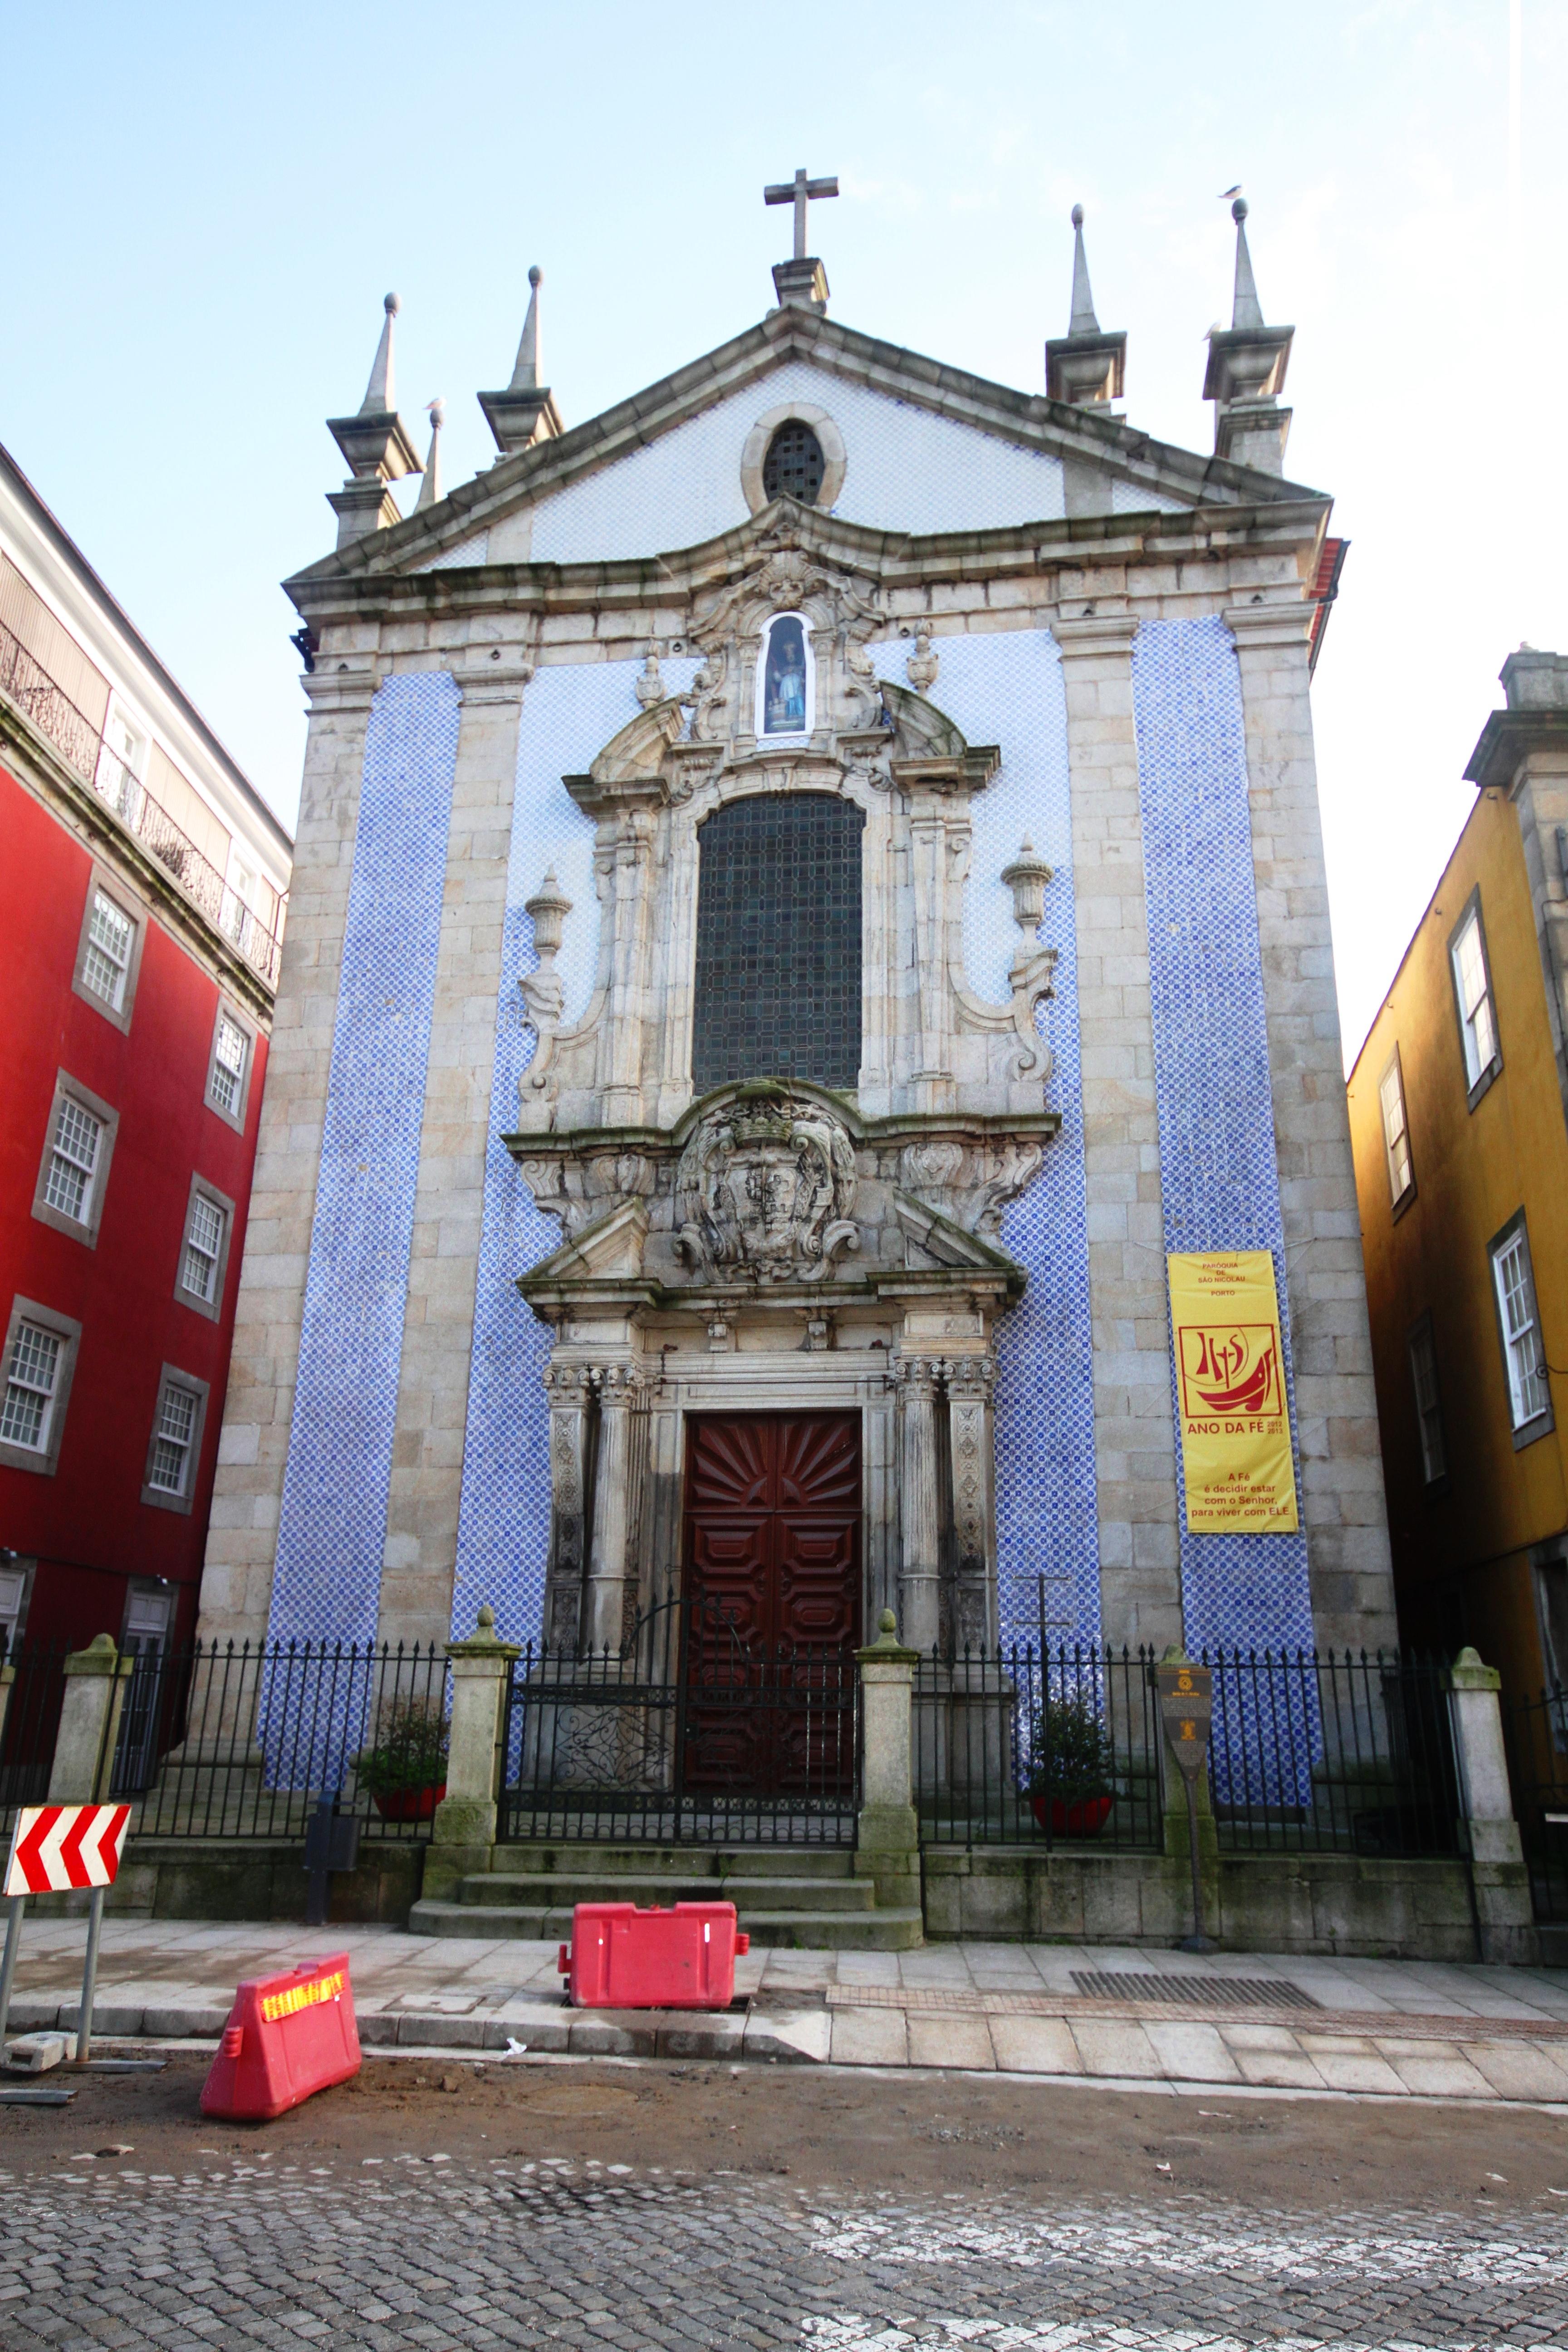 5edee697f2a7 File:Church of São Nicolau - Porto (2).JPG - Wikimedia Commons